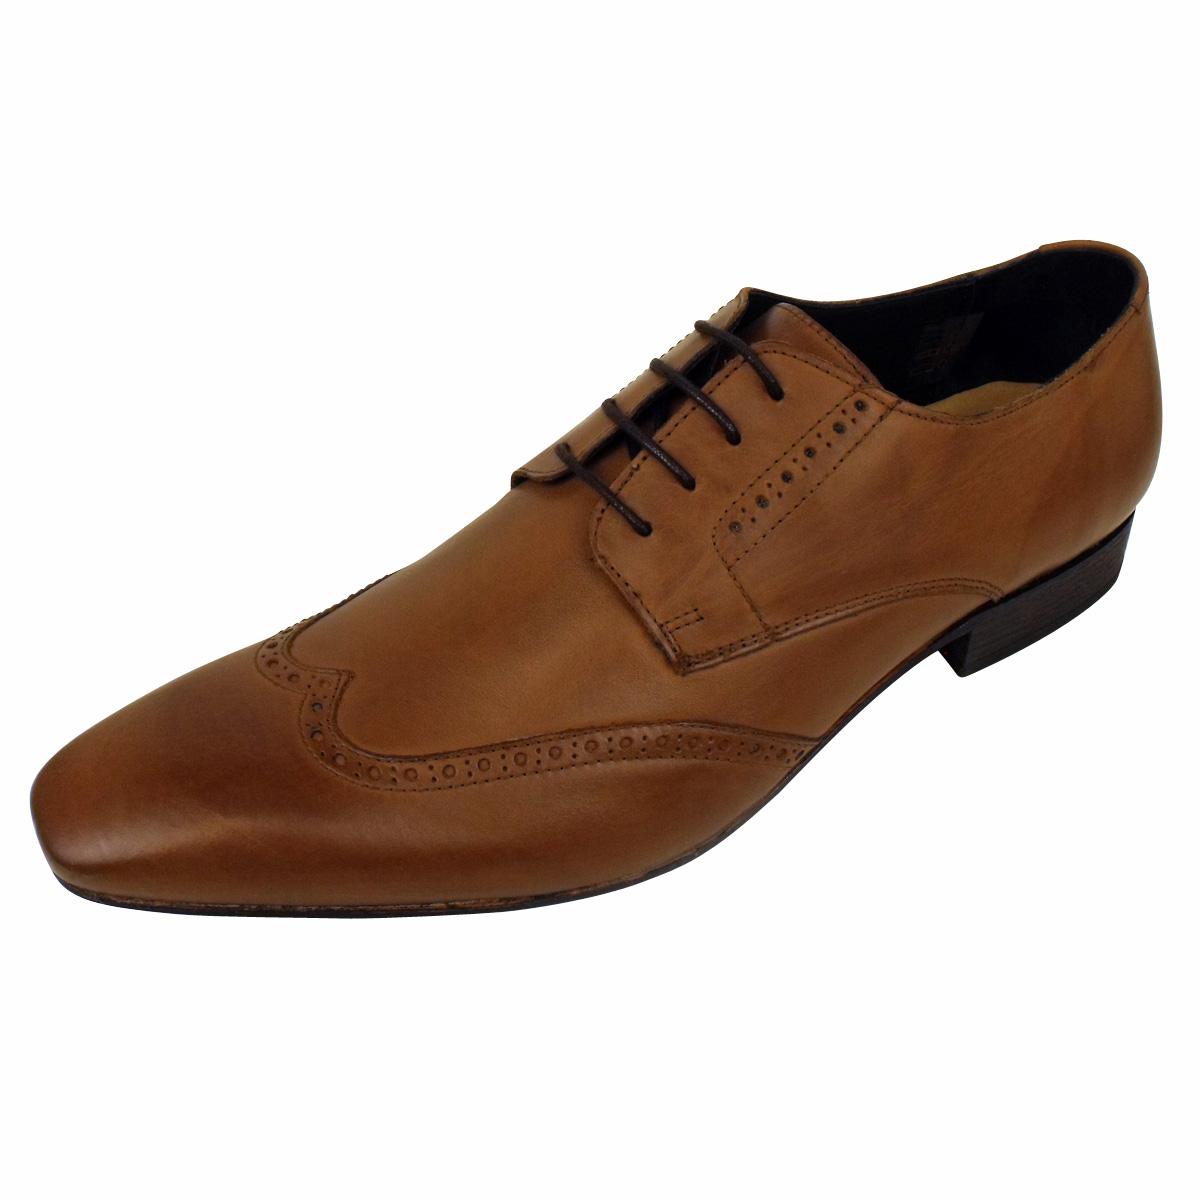 Hudson Shoes Womens Brogues